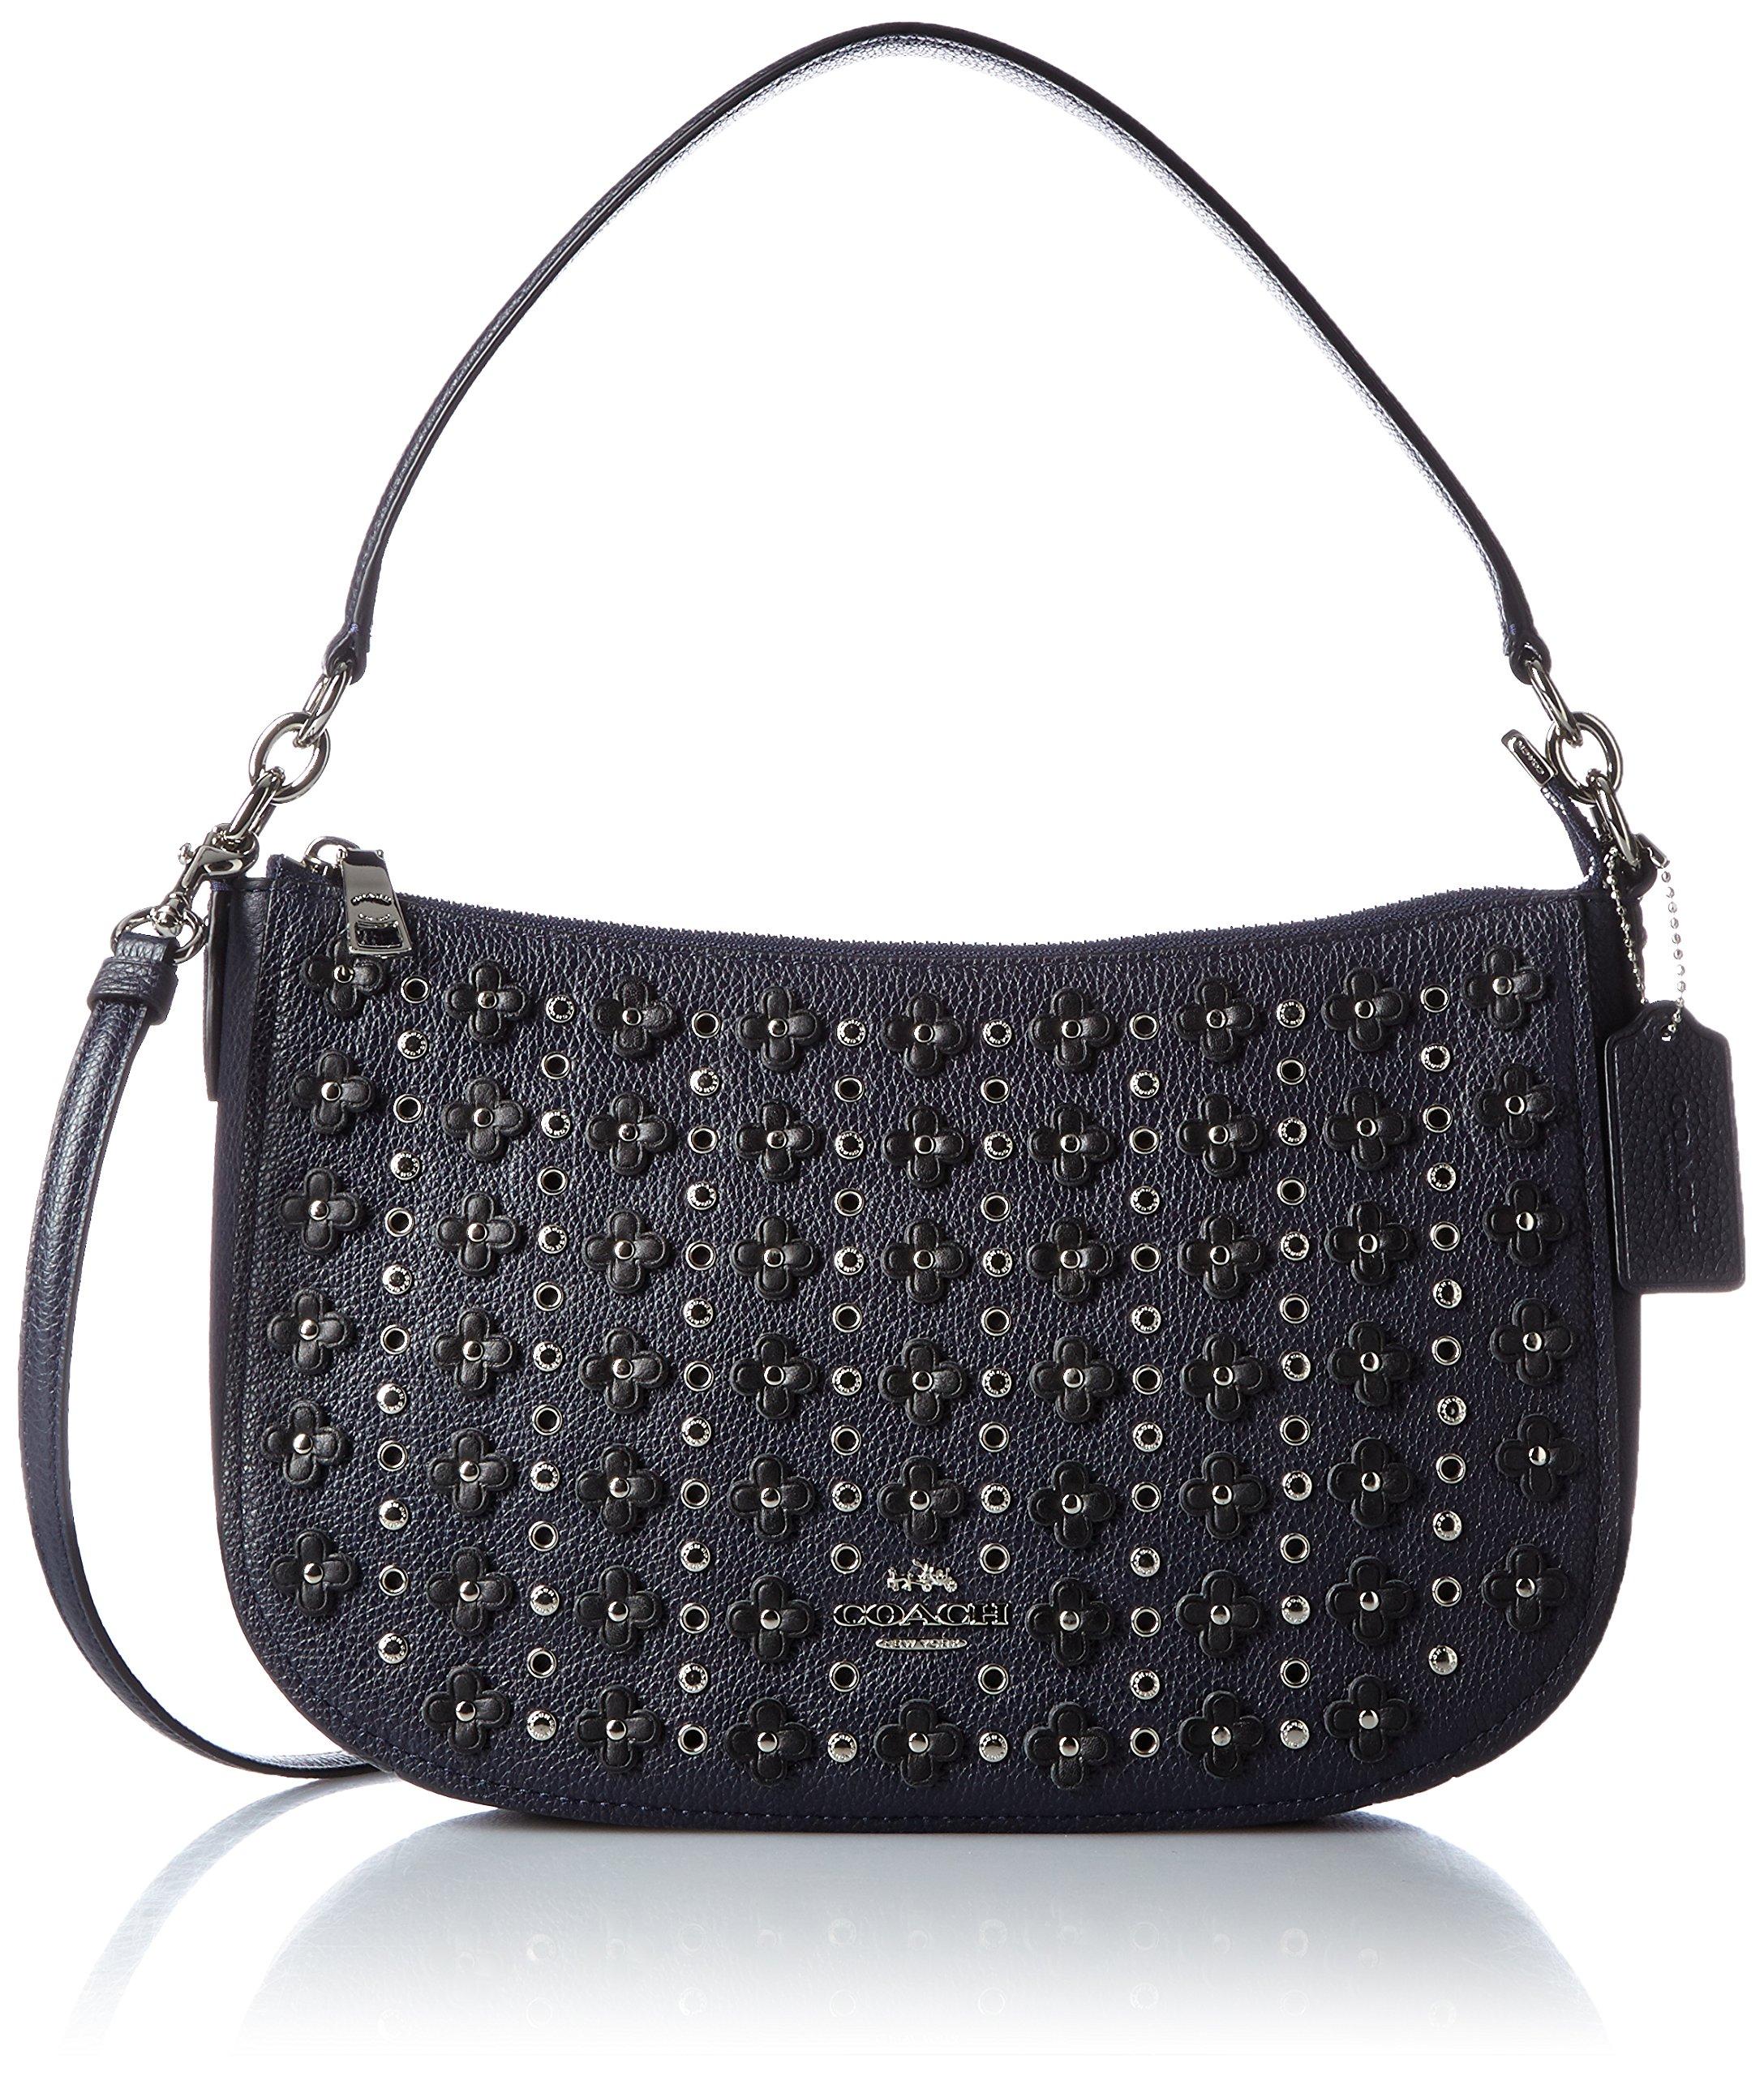 COACH Women's Floral Rivets Chelsea Crossbody Sv/Navy/Black Crossbody Bag